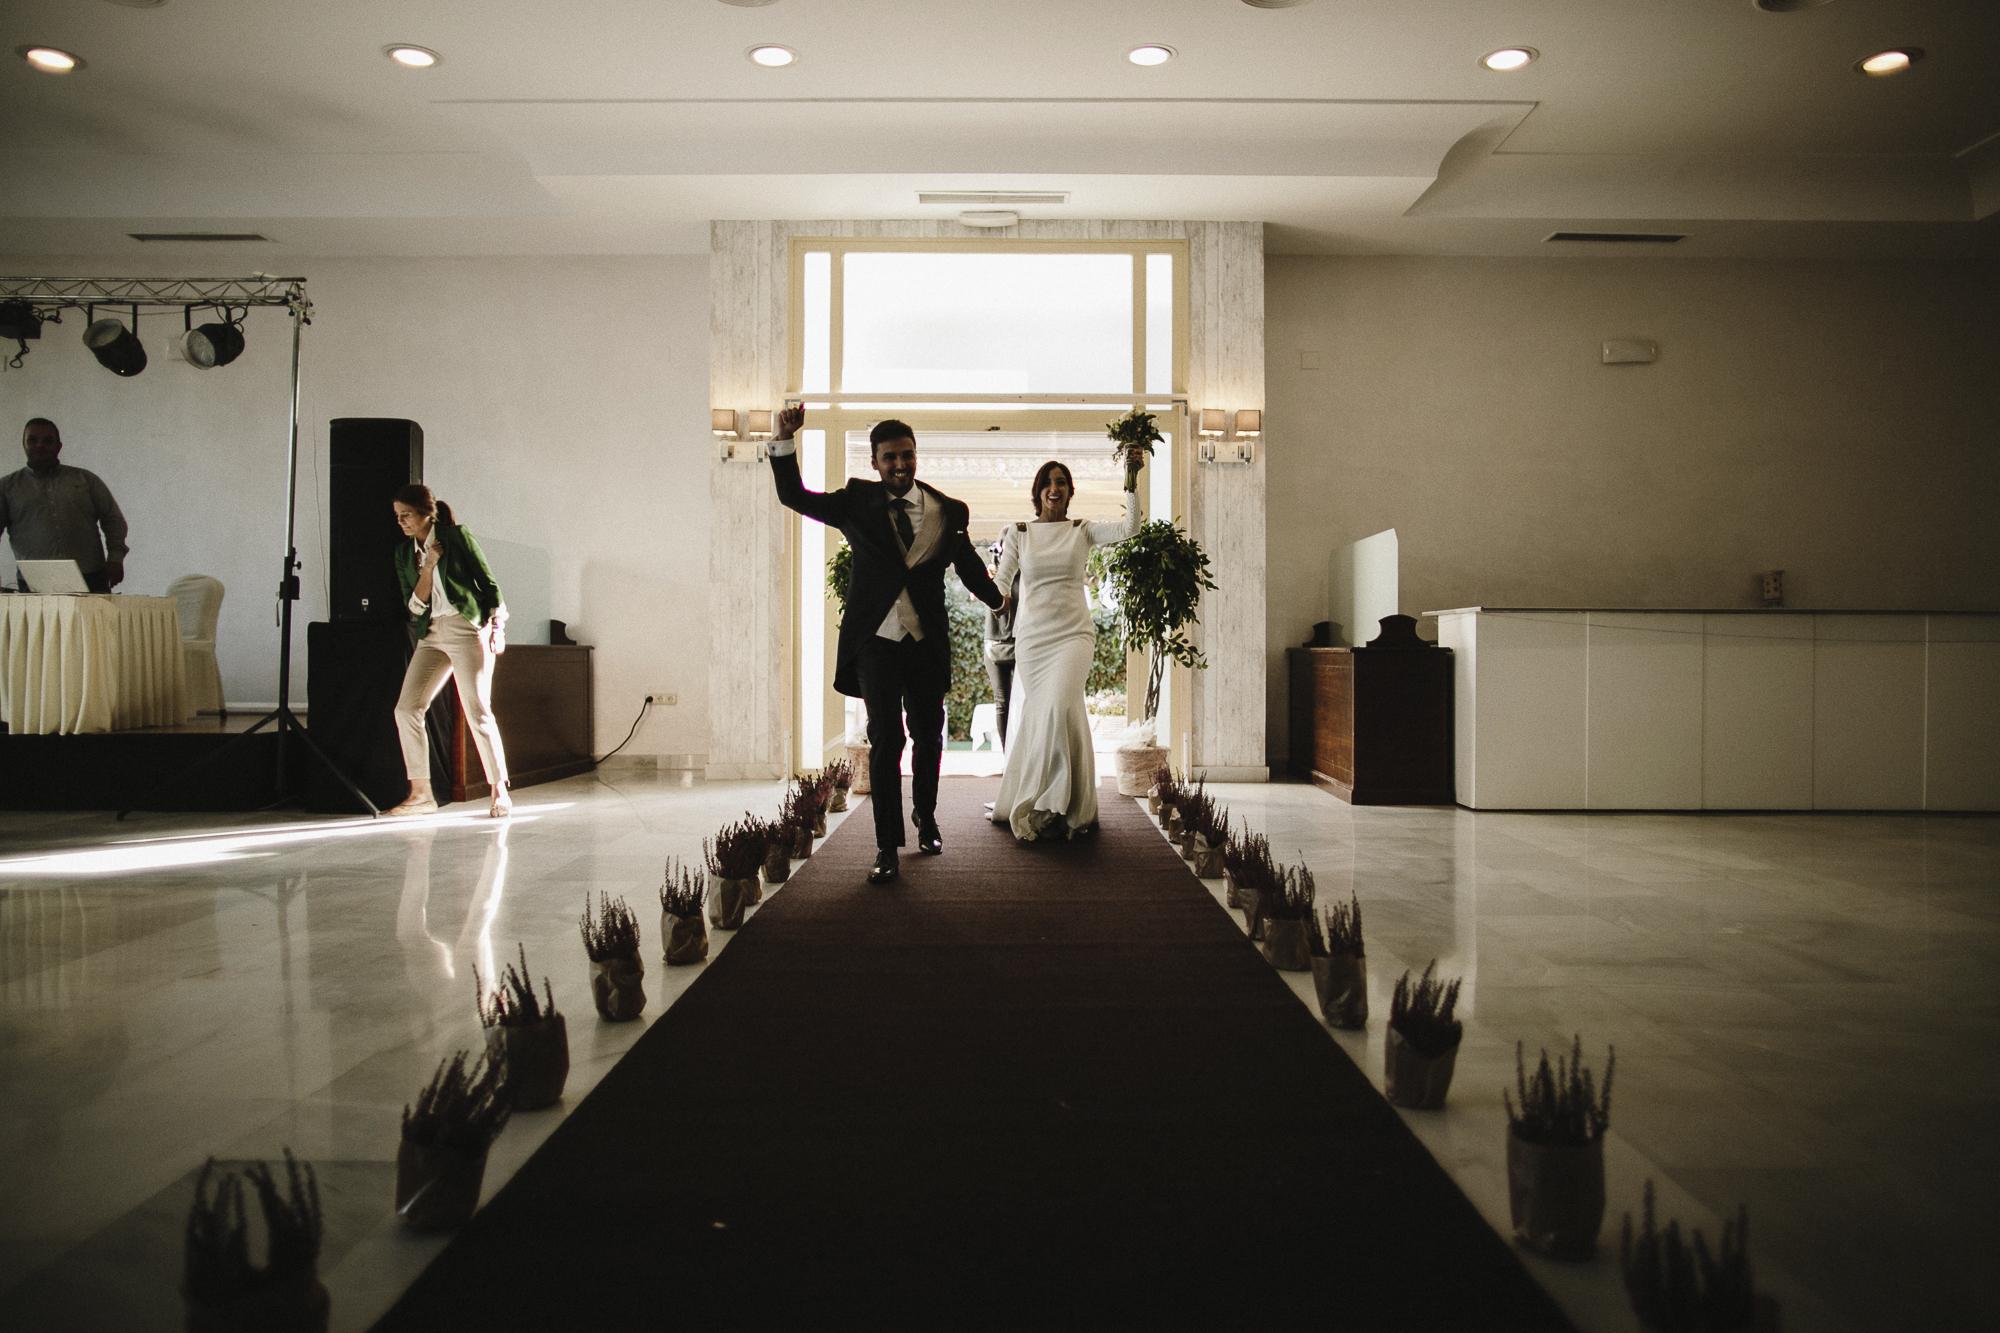 alfonso_flores_destination_wedding_photogrpaher_españa-108.jpg